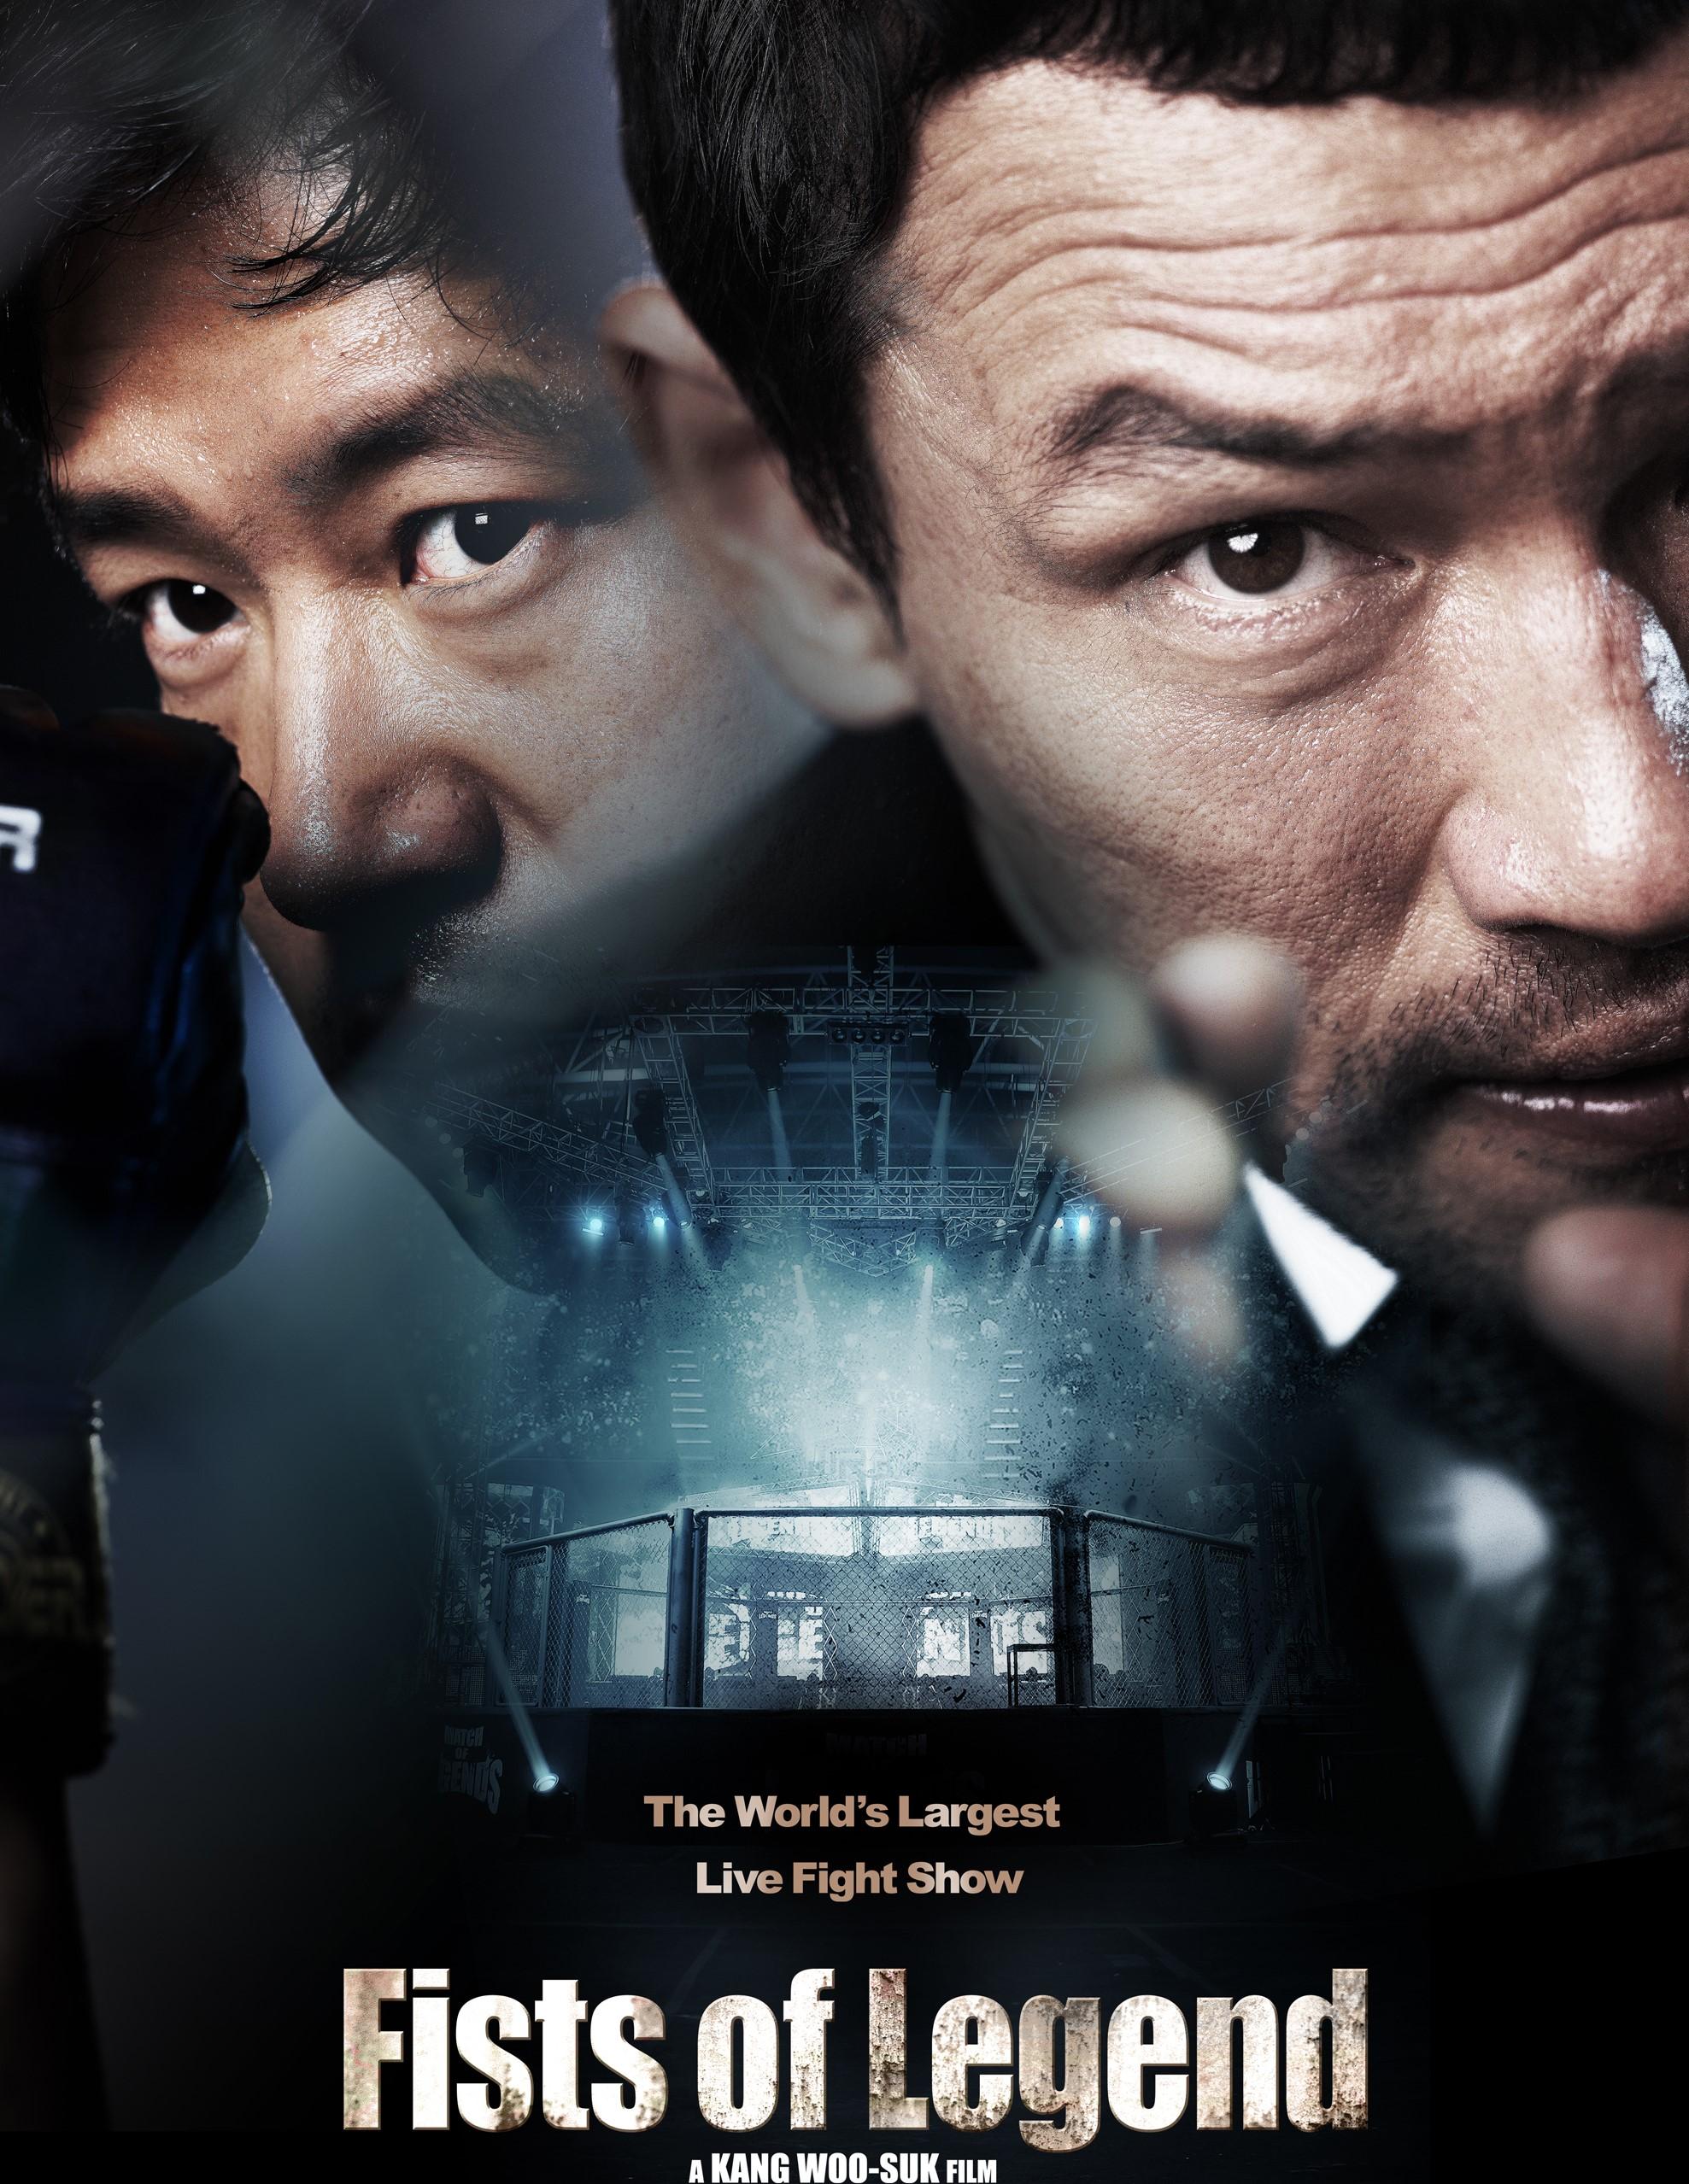 Fists of Legend (2013) | นักสู้จ้าวสังเวียน [พากย์ไทย]